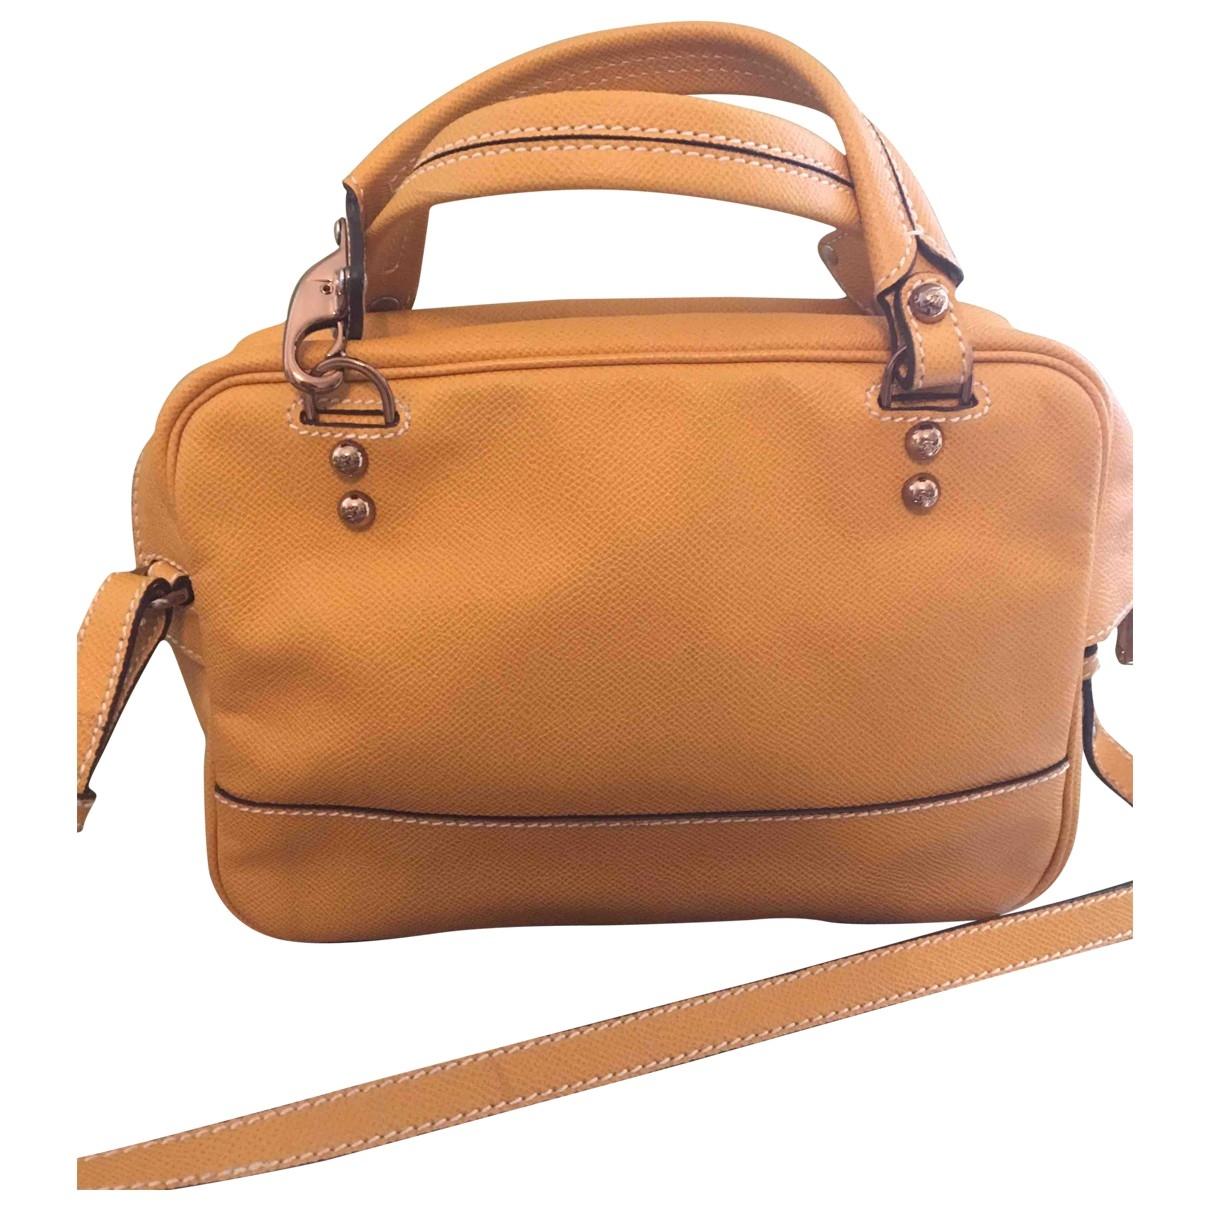 Fay \N Yellow Leather handbag for Women \N